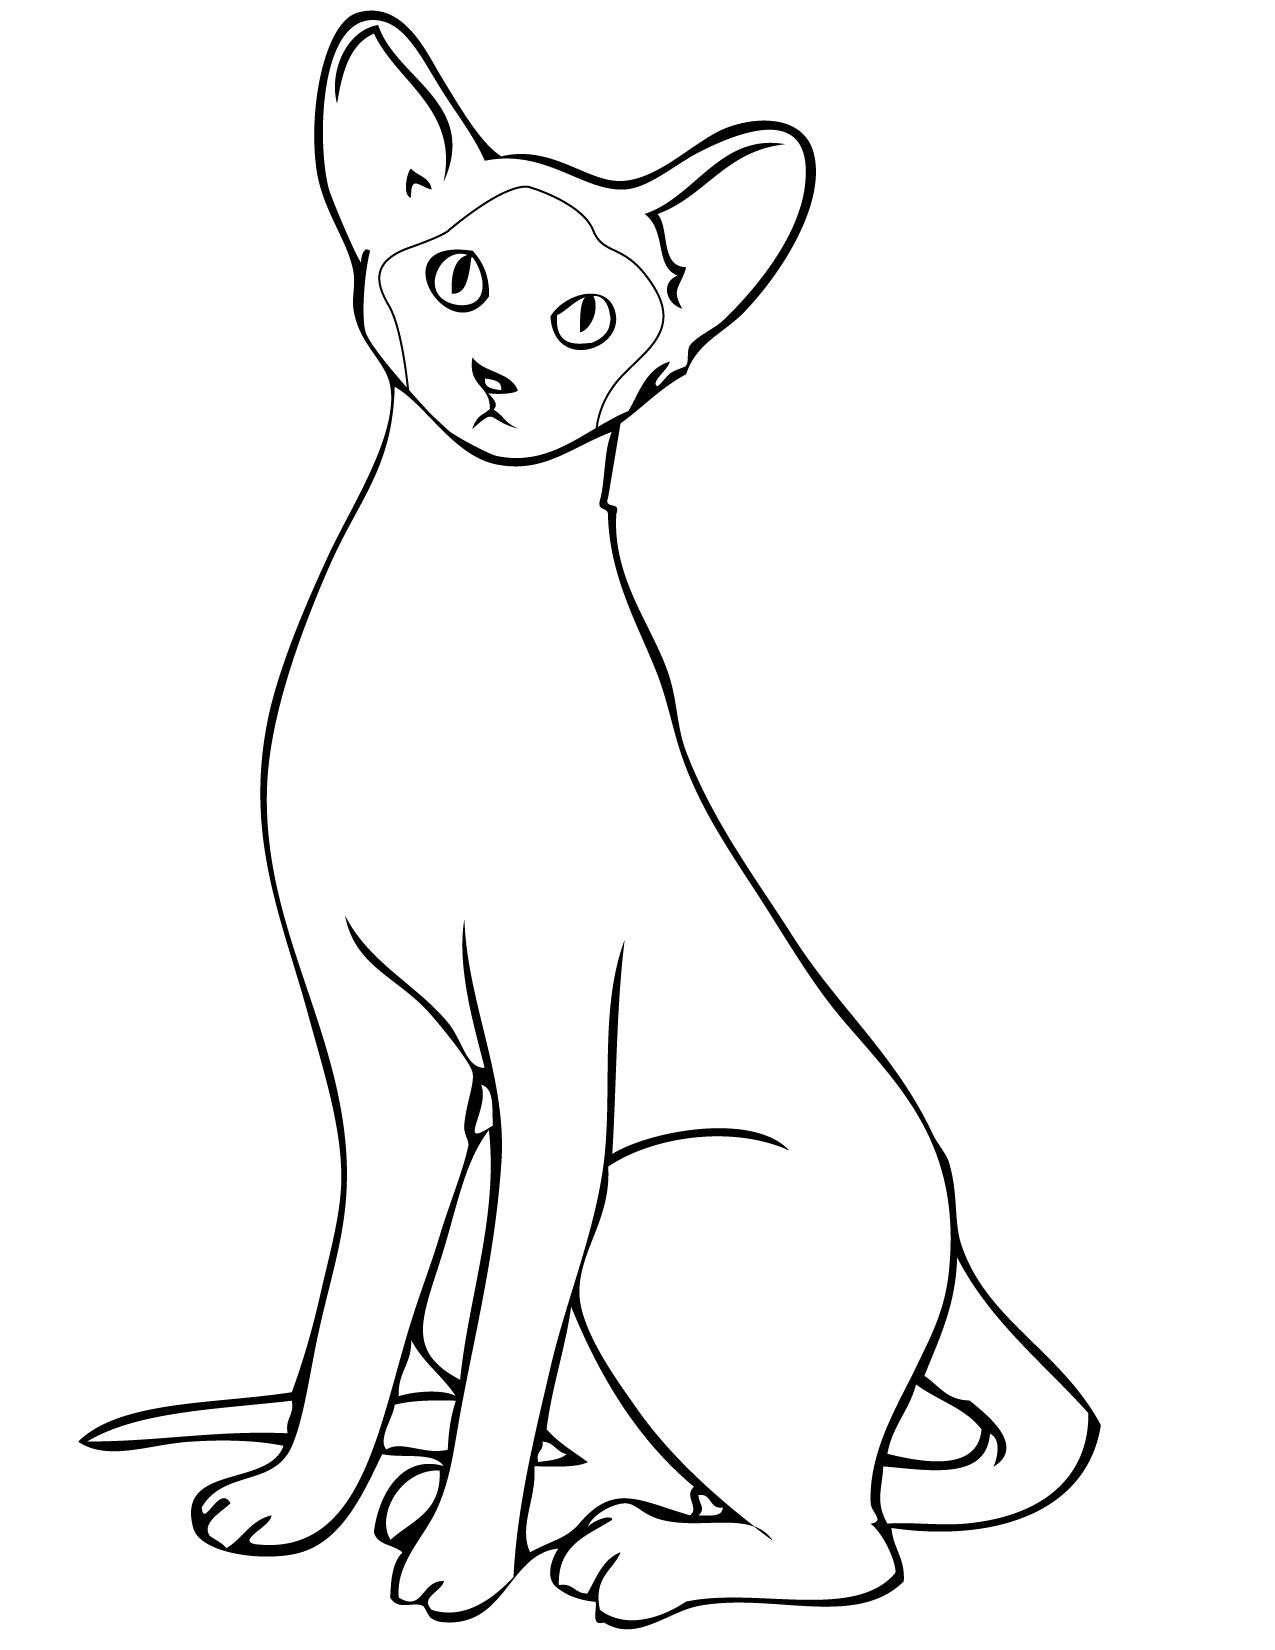 Siamese Cat Drawing at GetDrawings